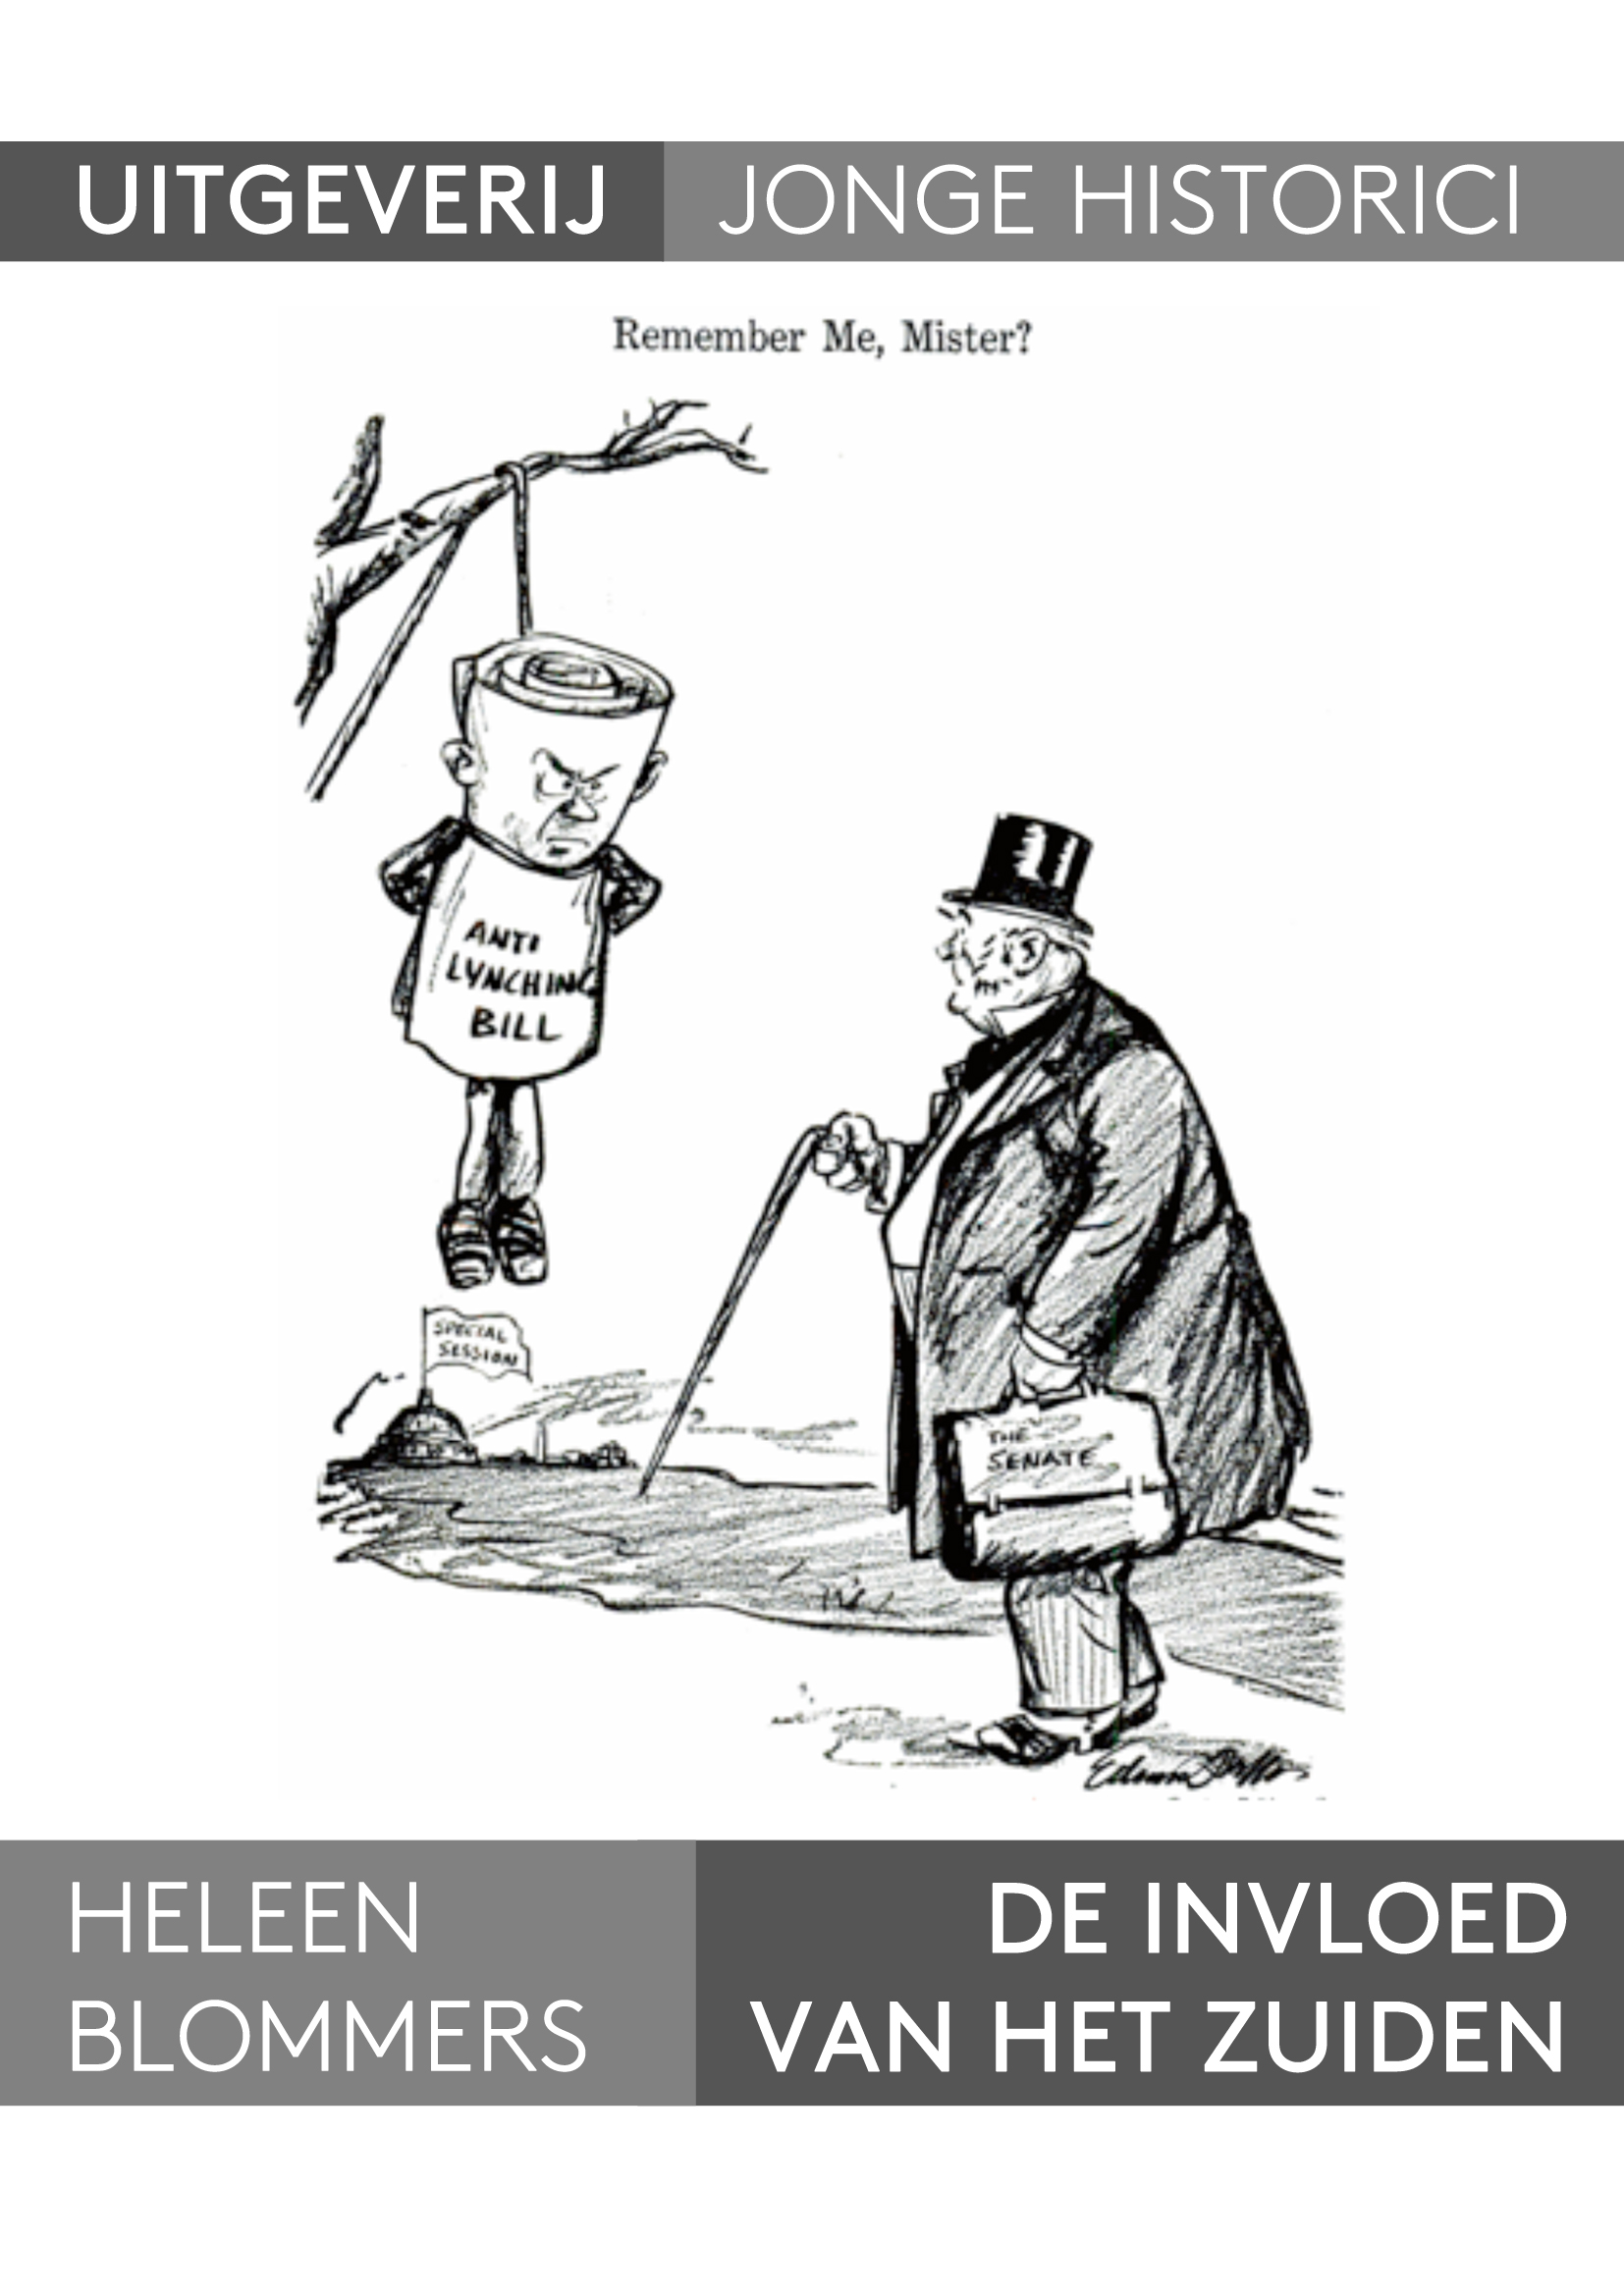 Longread: Heleen Blommers, De macht van publieke opinie: waarom federale anti-lynchwetgeving niet tot stand kwam